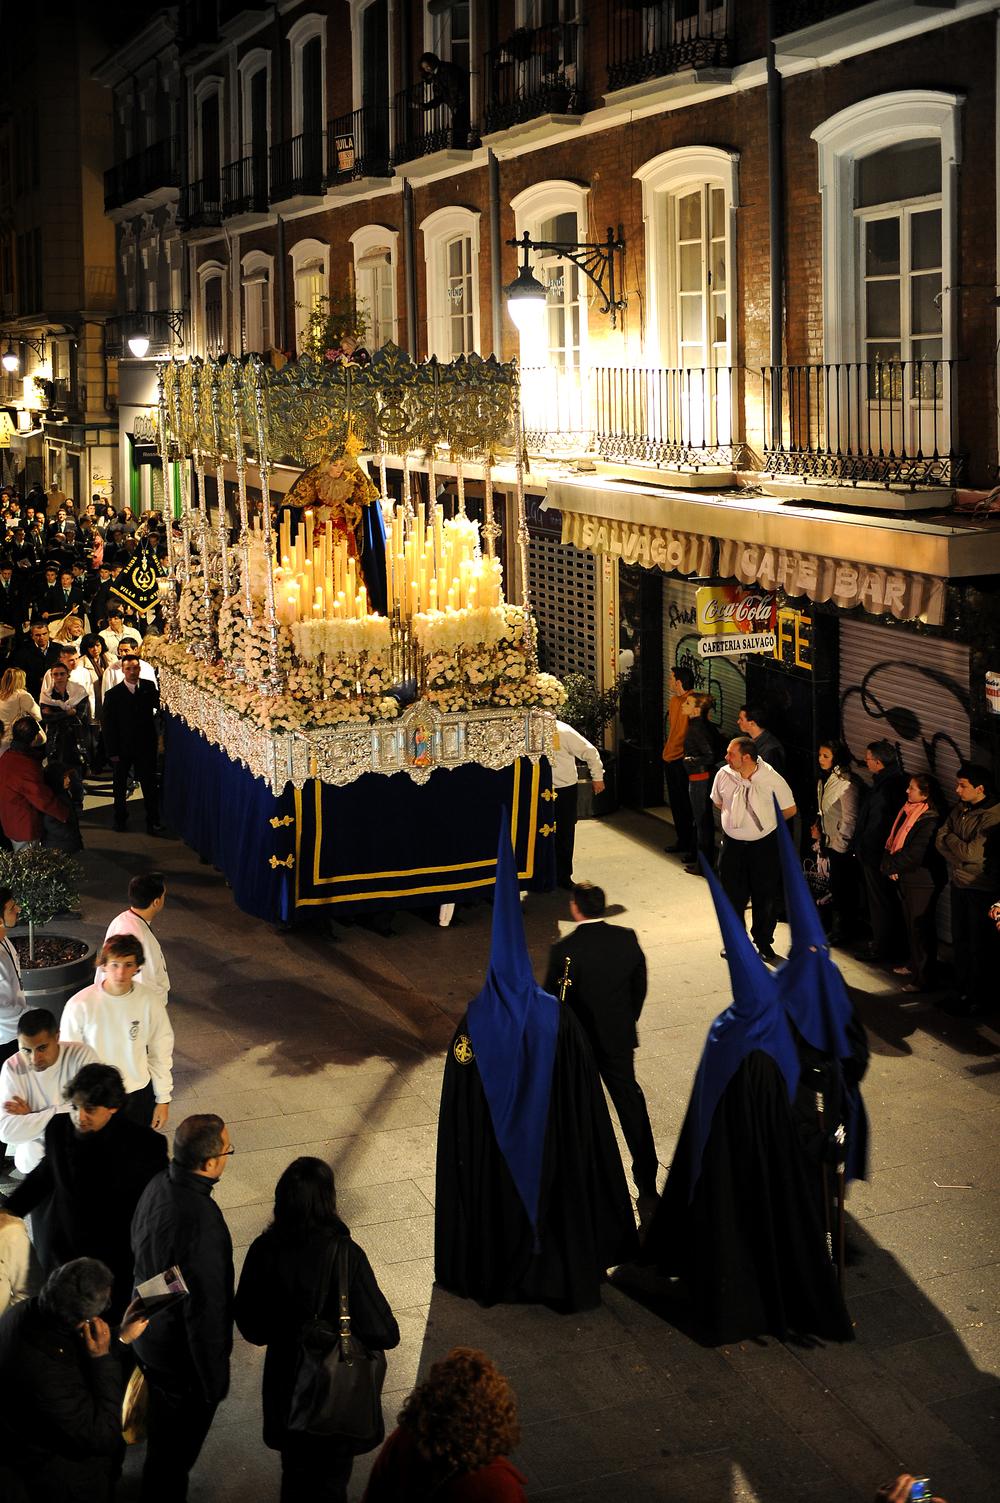 Pääsiäinen, matkablogi, Cadiz, Espanja, Andalusia